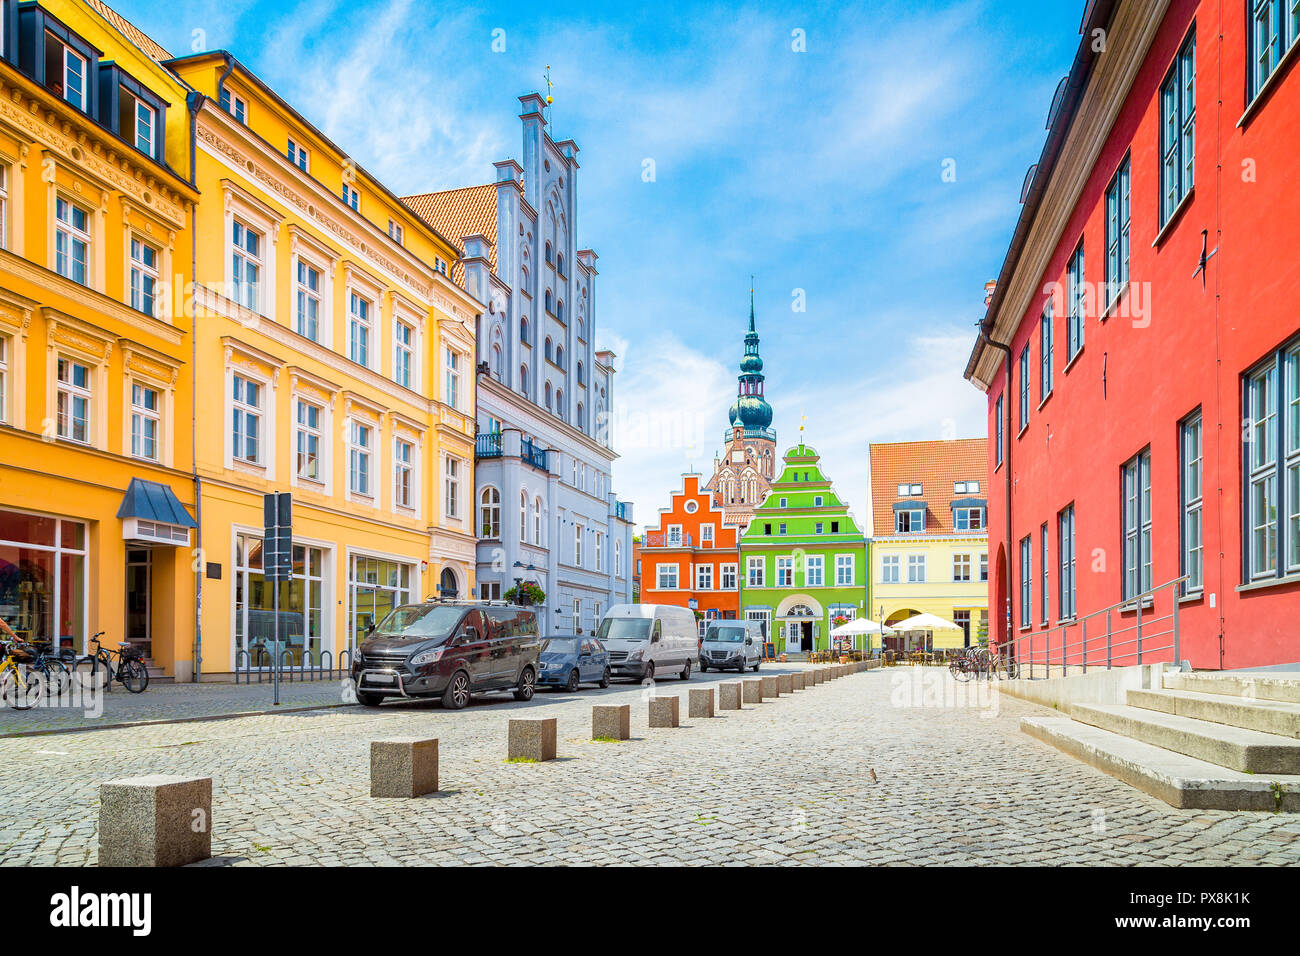 Historic city of Greifswald, Mecklenburg-Vorpommern, Germany - Stock Image